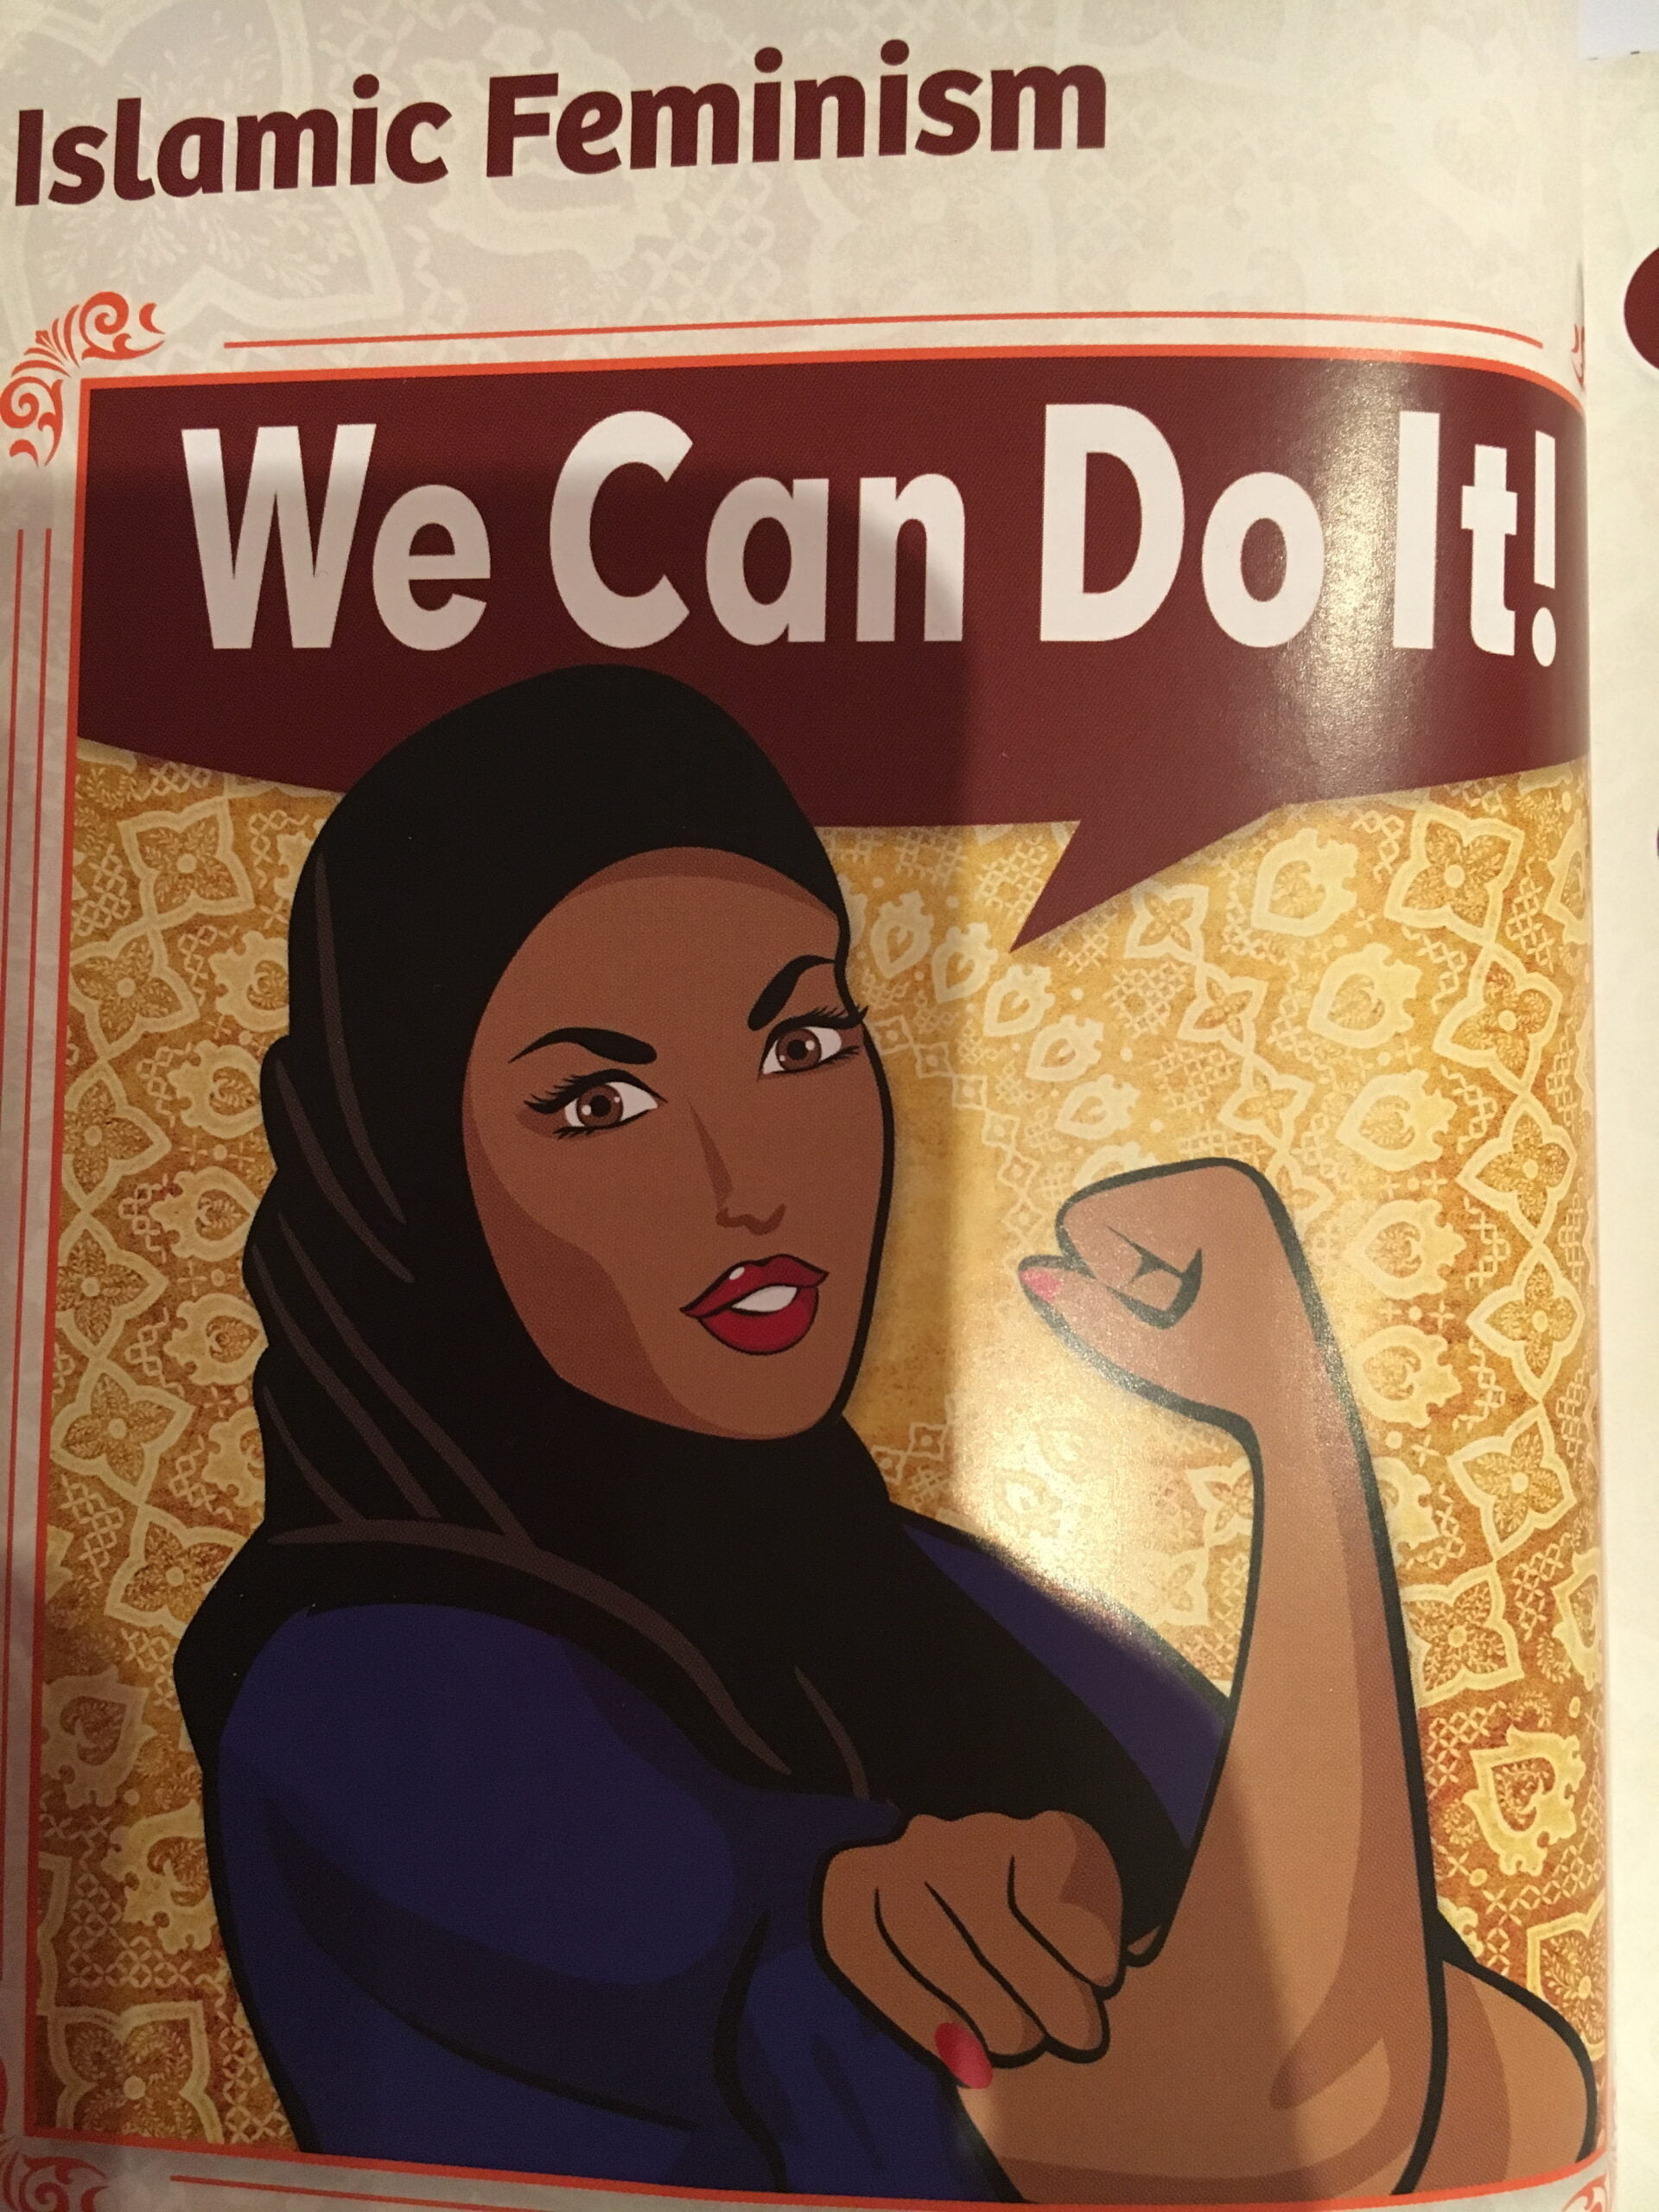 MWNUK: Muslim women unite to change the future